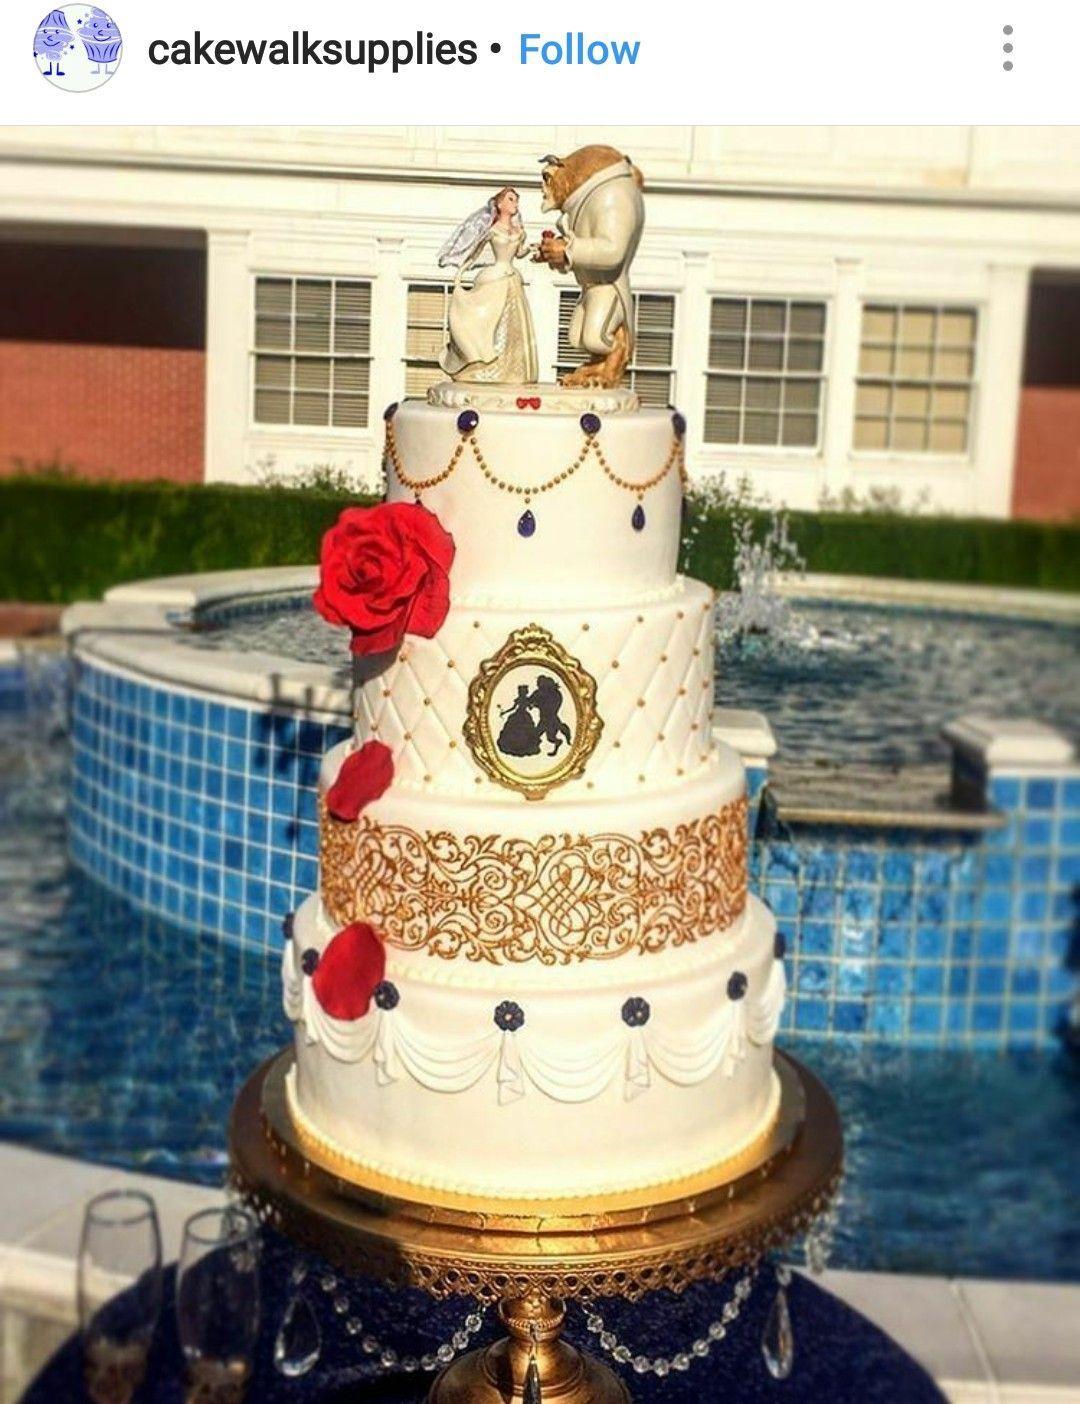 Wedding Cake Beauty And The Beast Beauty And The Beast Wedding